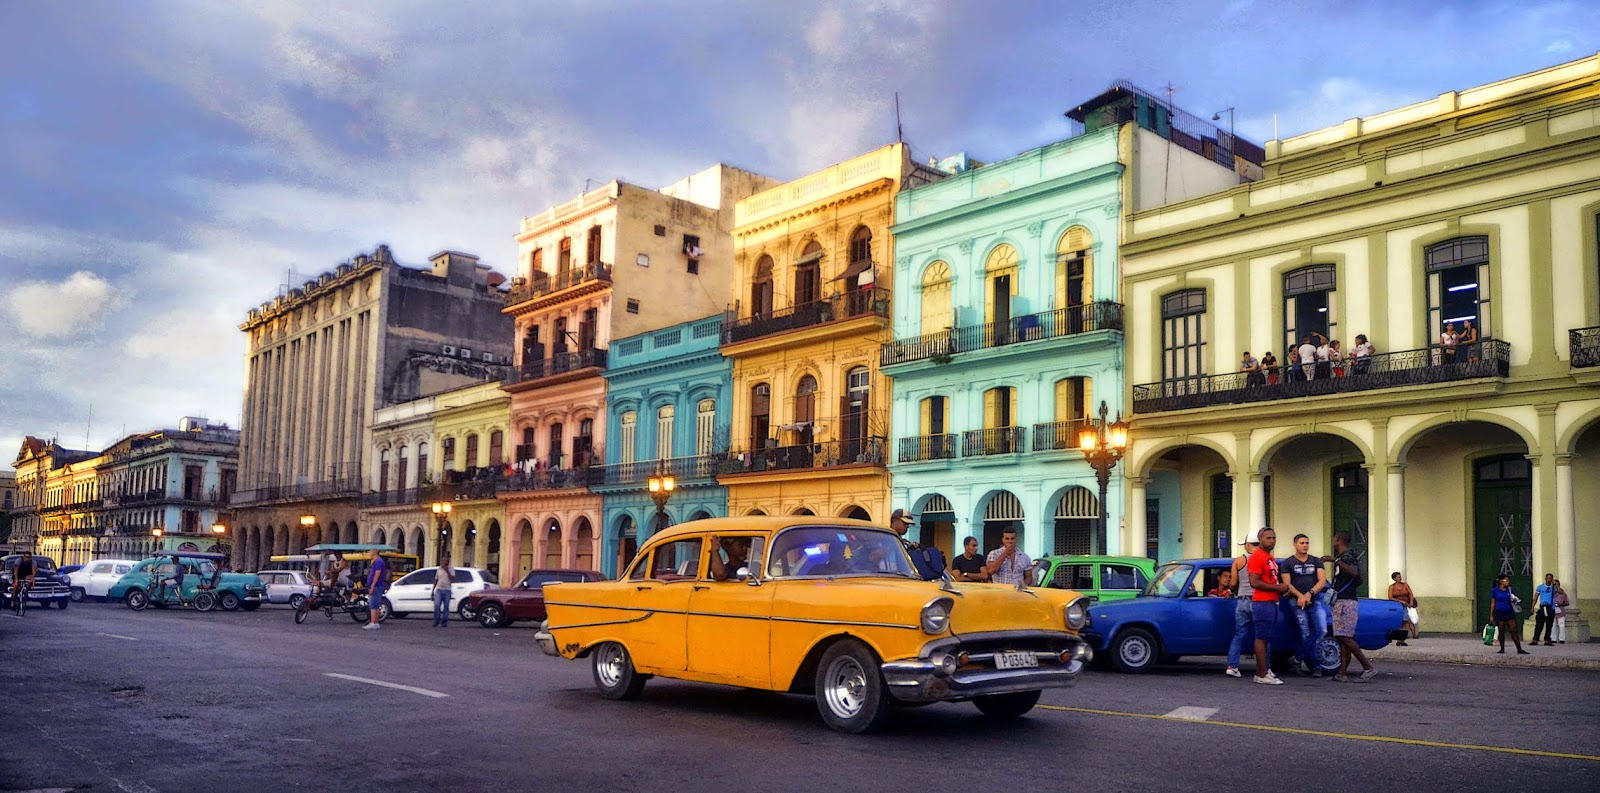 Cuba La Habana gentileza de www.enteratelogrono.wordpress.com